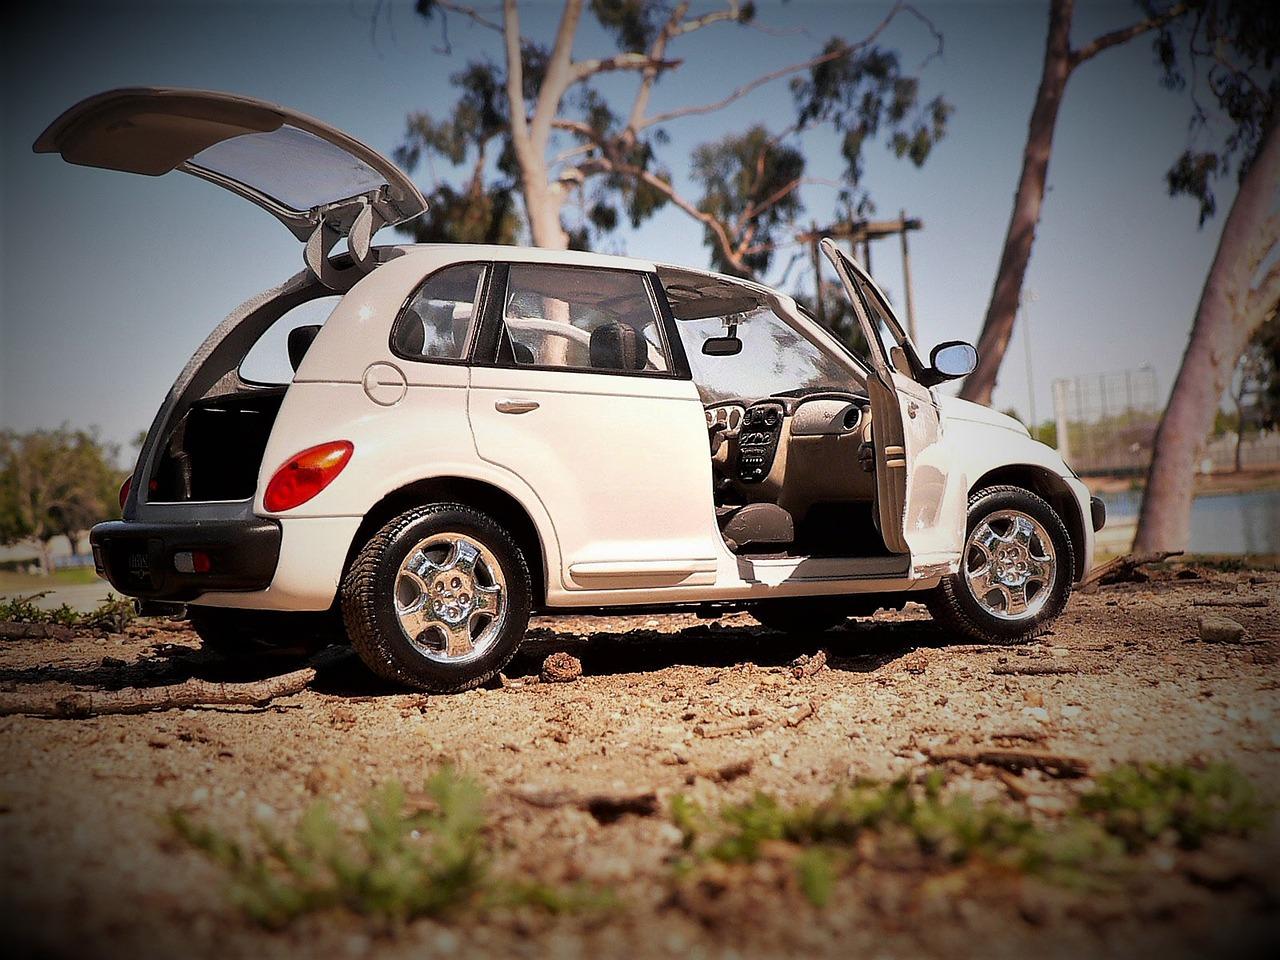 Found at: https://pixabay.com/photos/car-auto-vehicle-automobile-2511368/